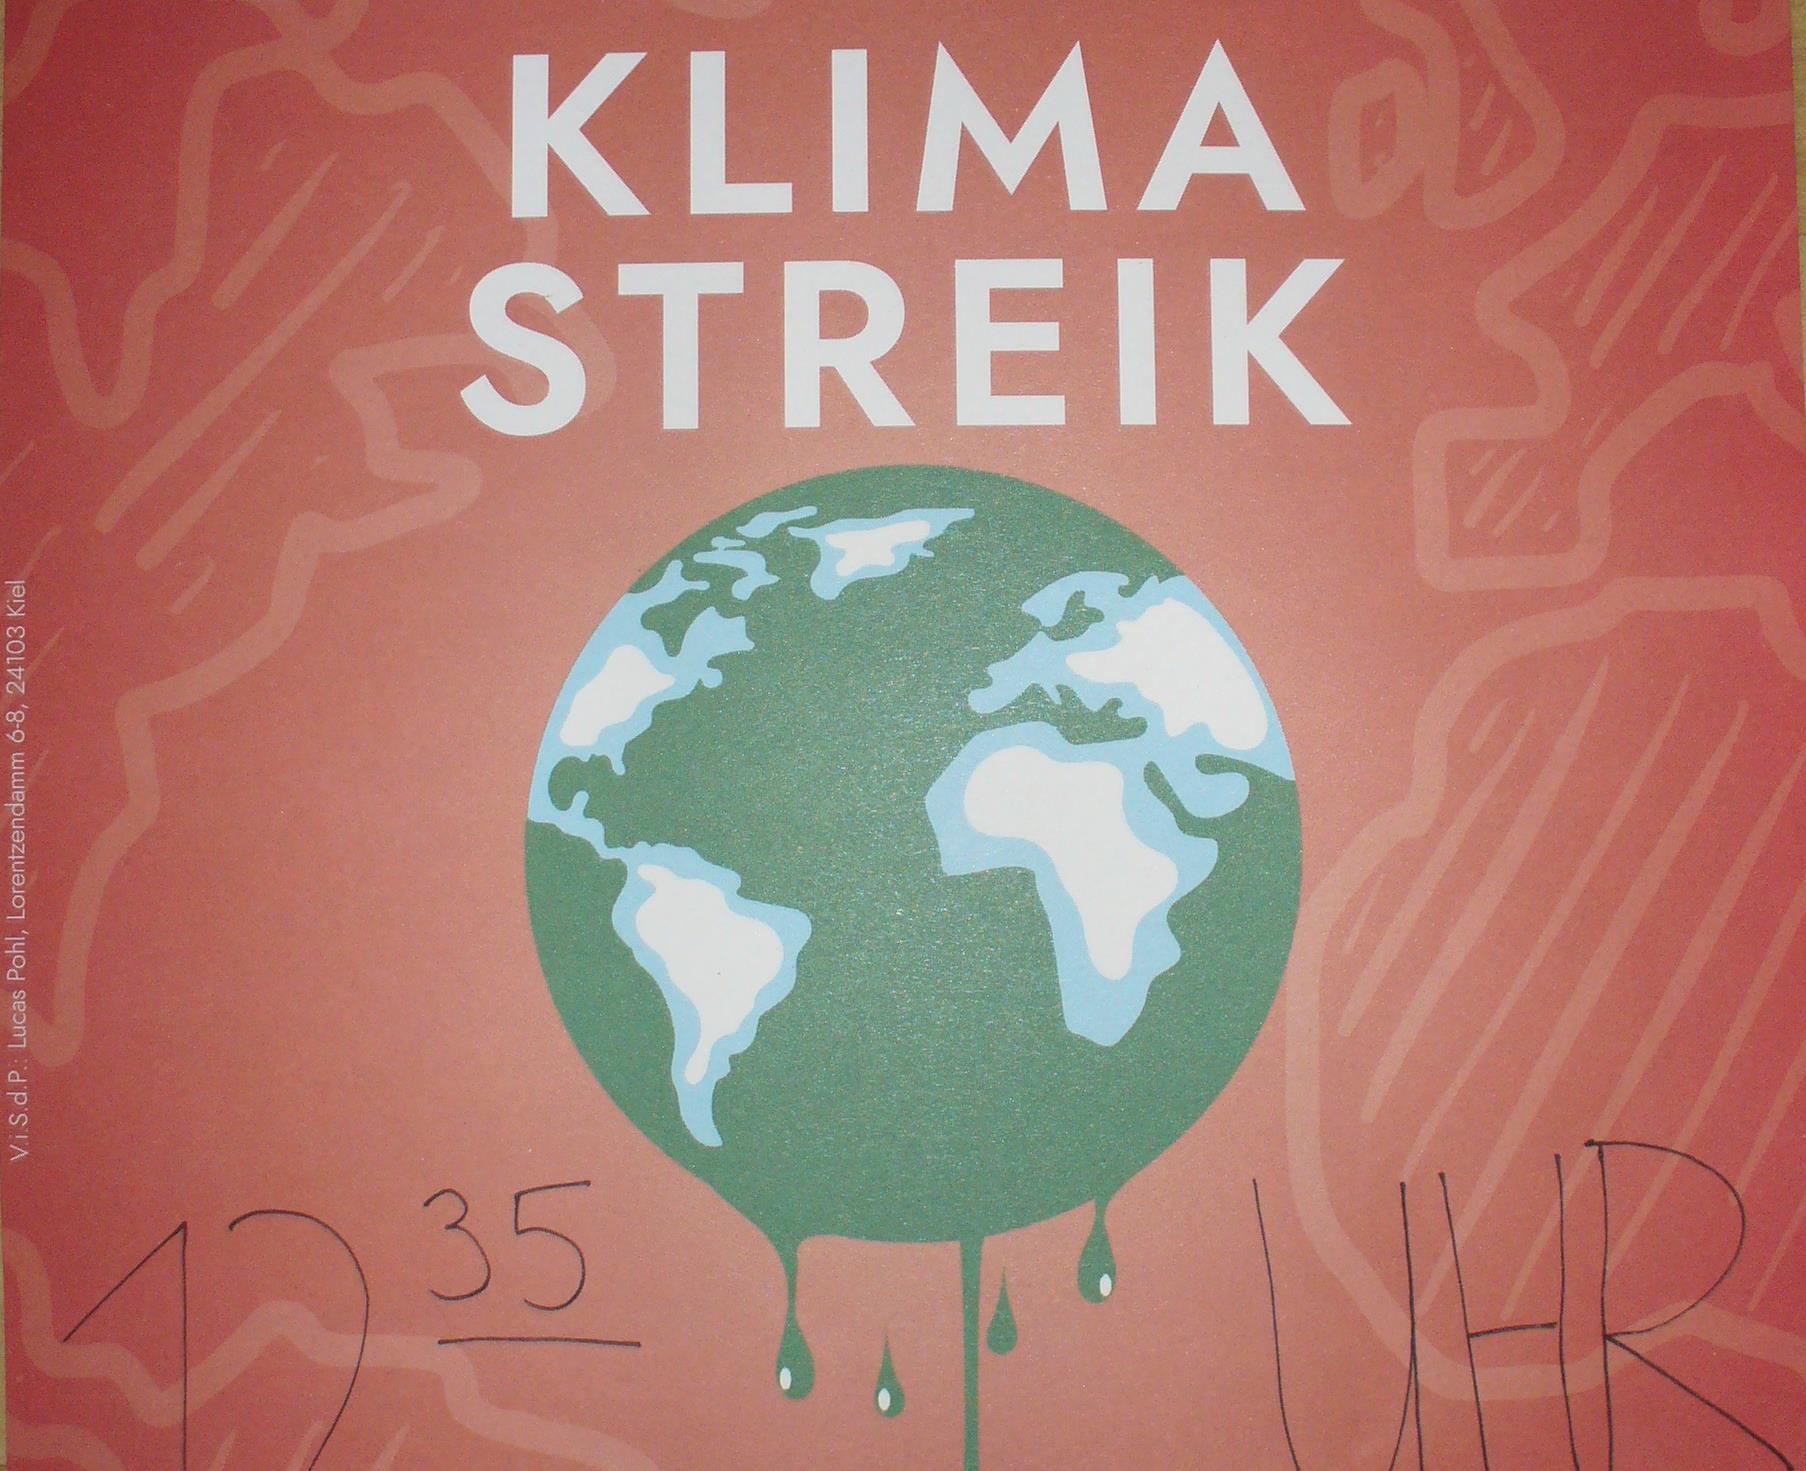 Klimastreik startet vorm Gymnasium